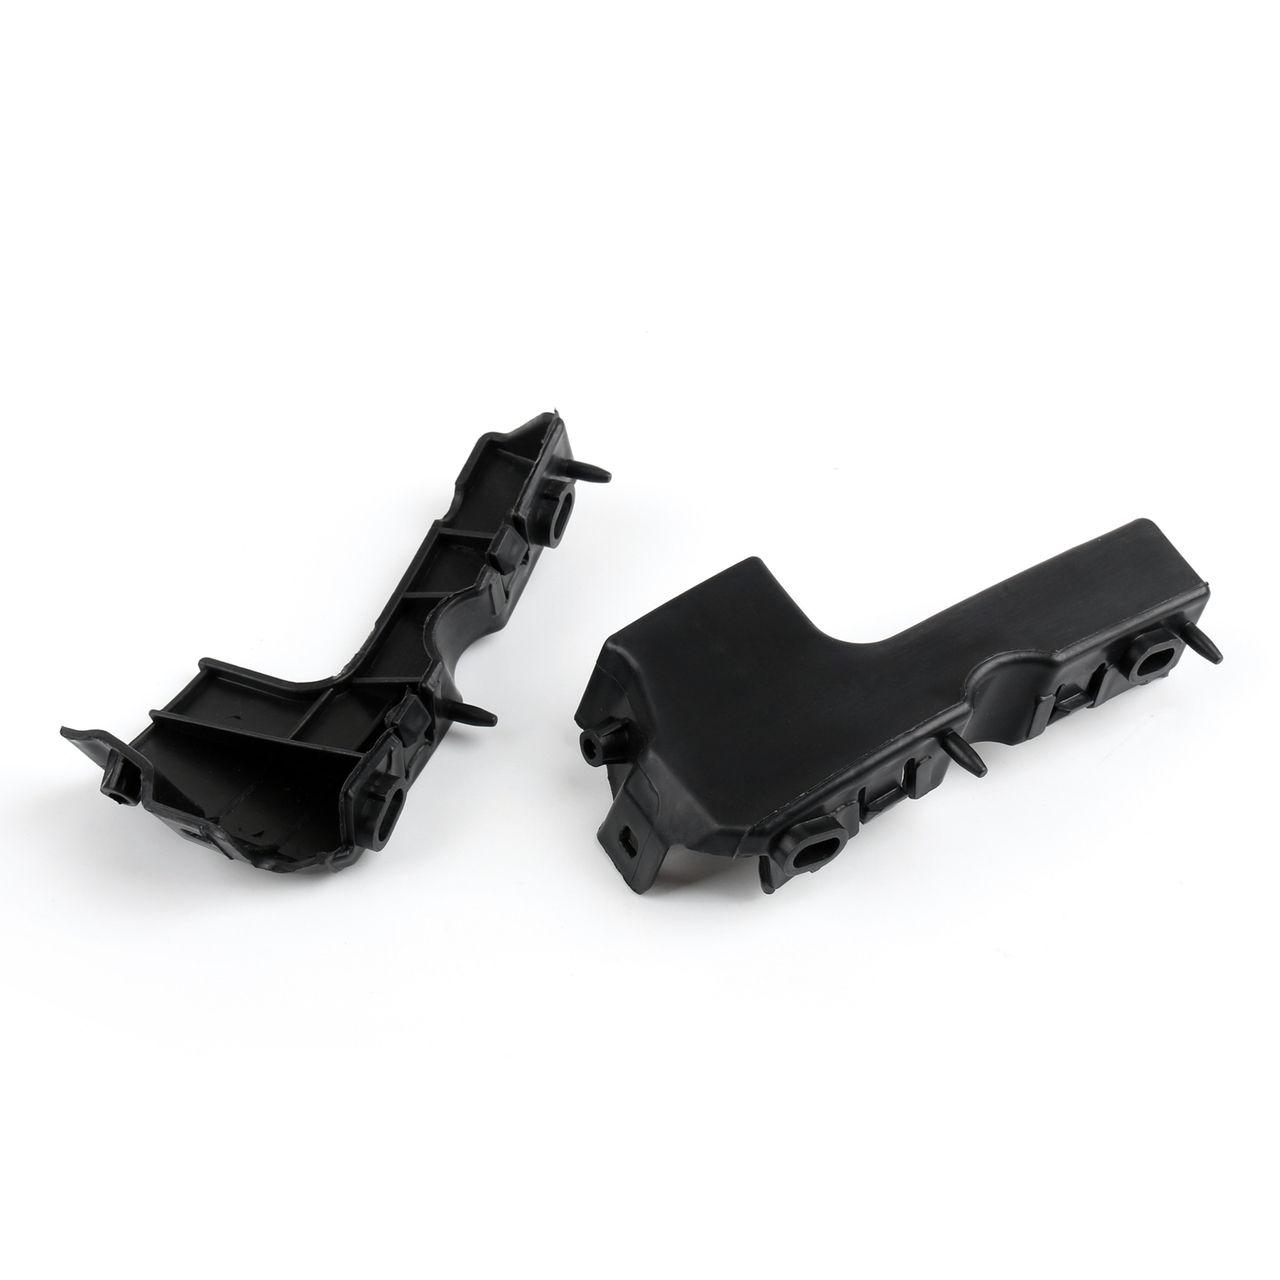 Front Left Right Bumper Guide Fender Mount Bracket For Audi A4 B7 Rs4 06 08 Black Audi A4 Audi Audi A4 B7